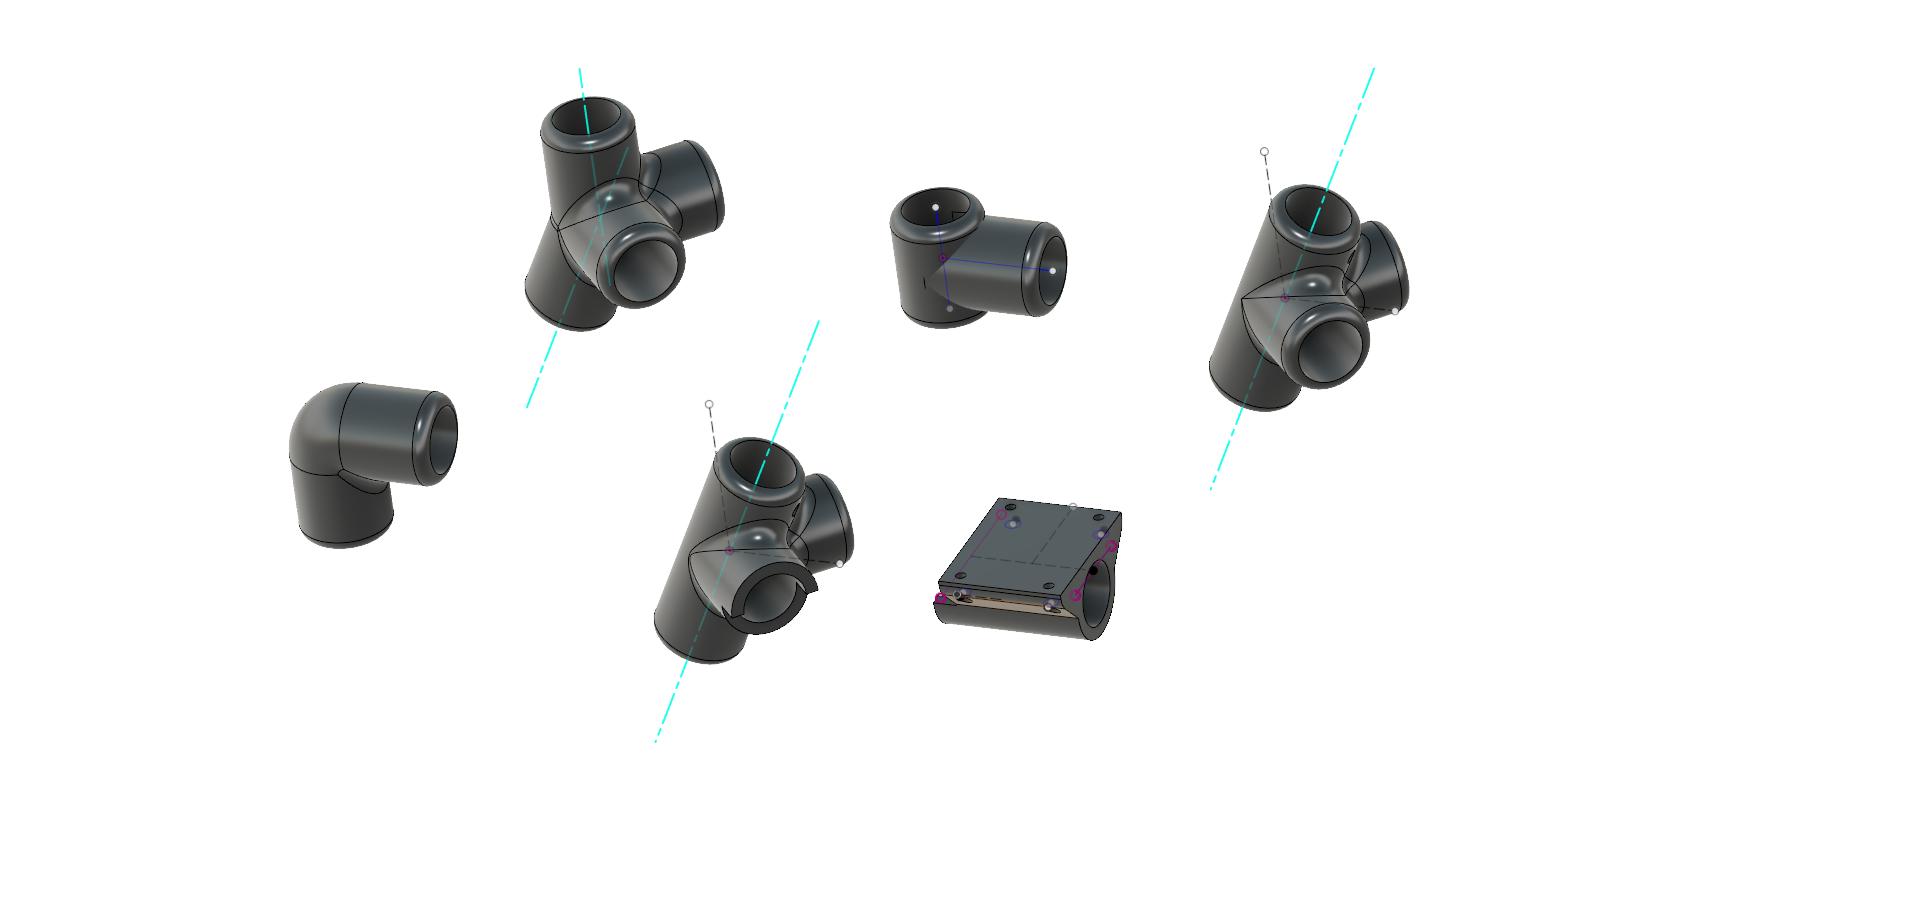 assemblage v1.png Download free STL file Picochaise • 3D printer object, PierreR